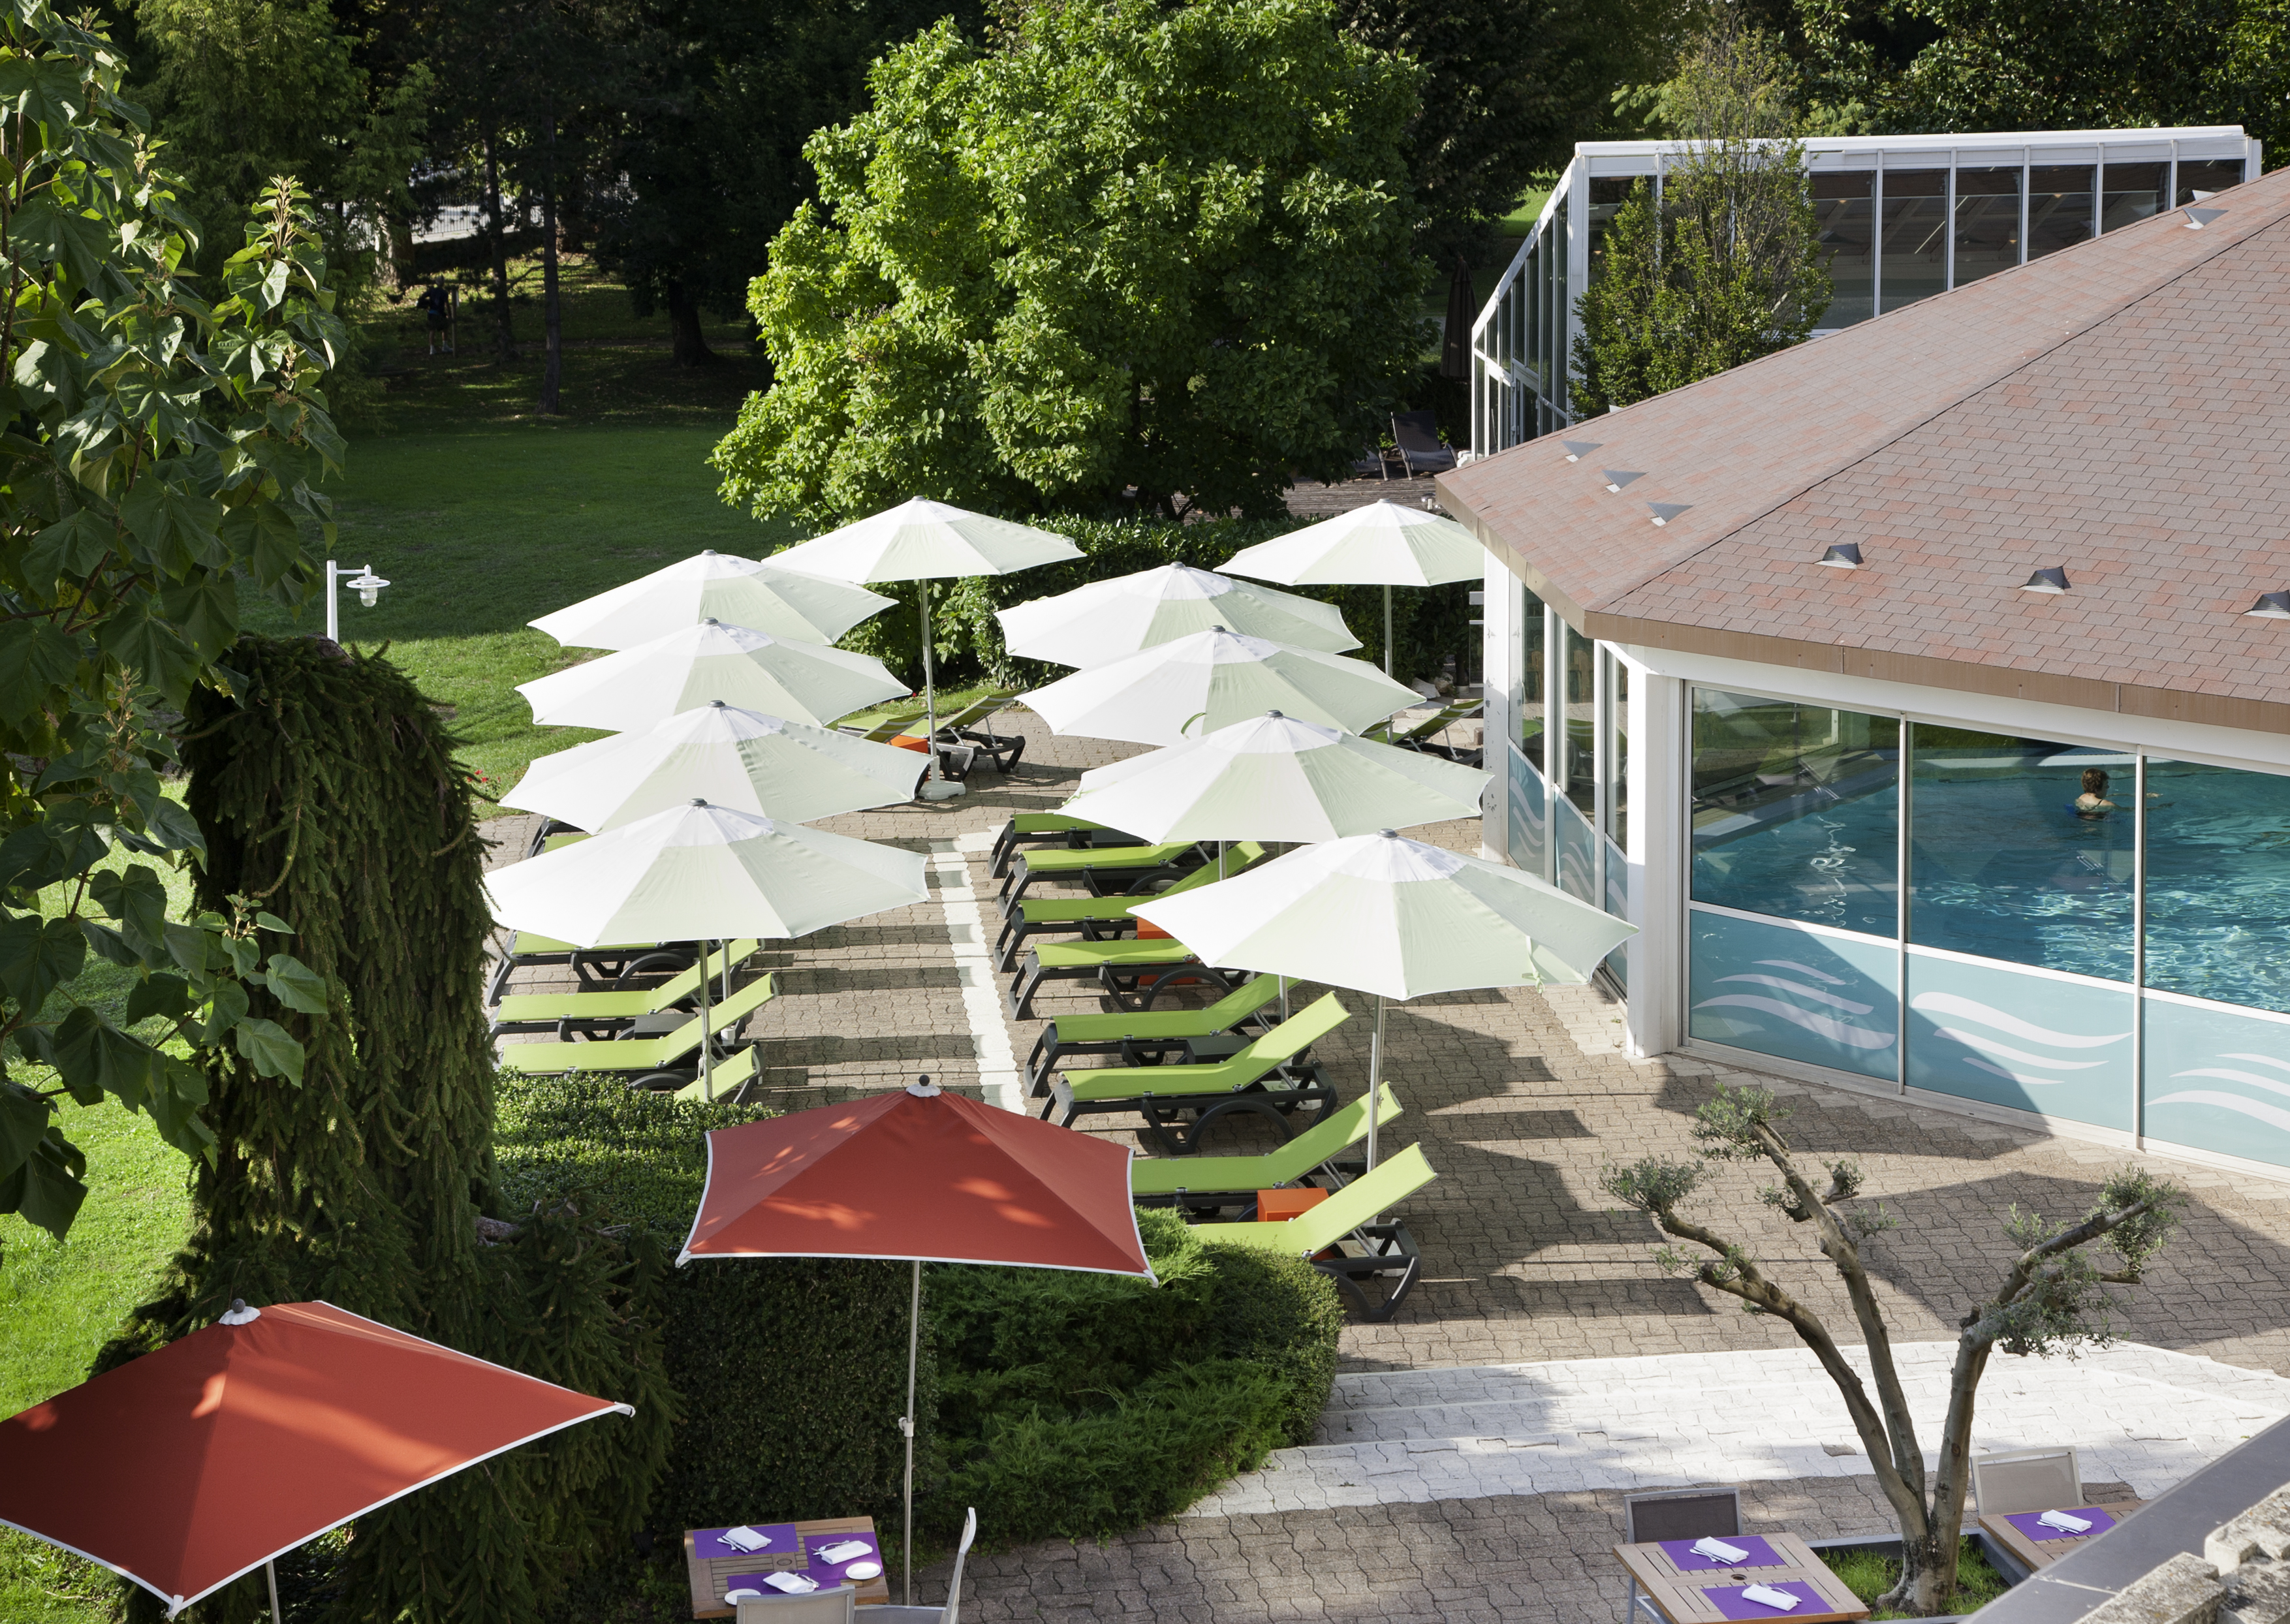 mercure hotel domaine de marlioz in aix les bains french alps savoie mont blanc. Black Bedroom Furniture Sets. Home Design Ideas